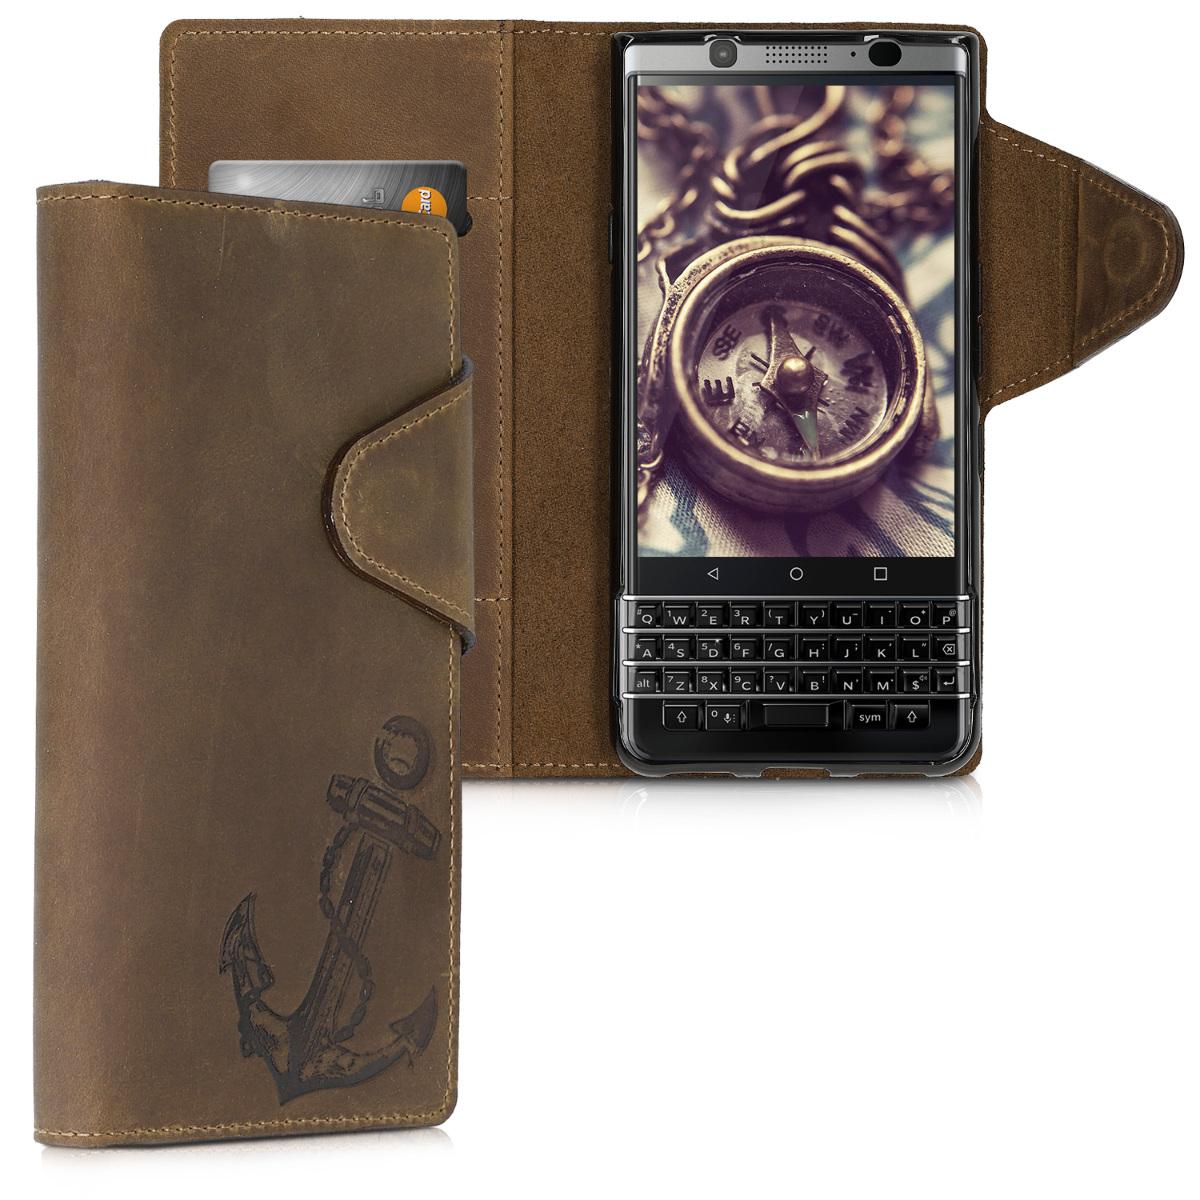 Kalibri Δερμάτινη Suede Θήκη- Πορτοφόλι Blackberry KEYone (Key1) - Brown (46464.02)